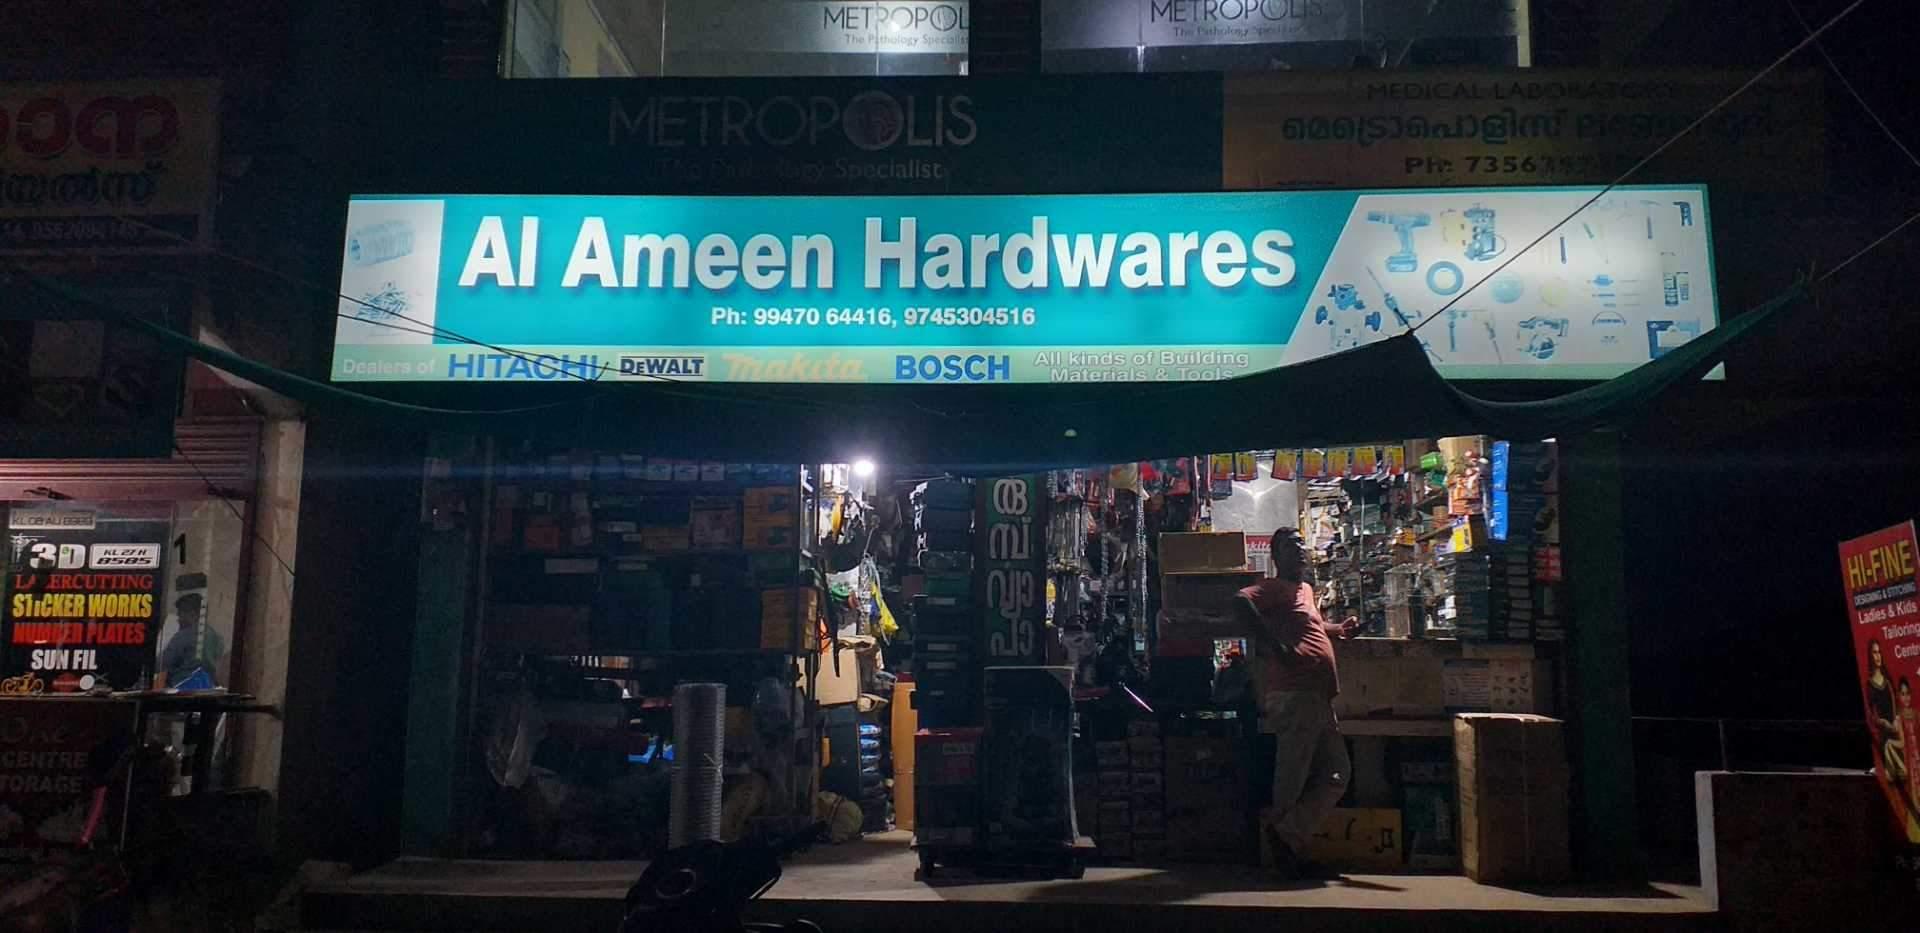 Al Ameen Hardwares, HARDWARE SHOP,  service in Mallappally, Pathanamthitta